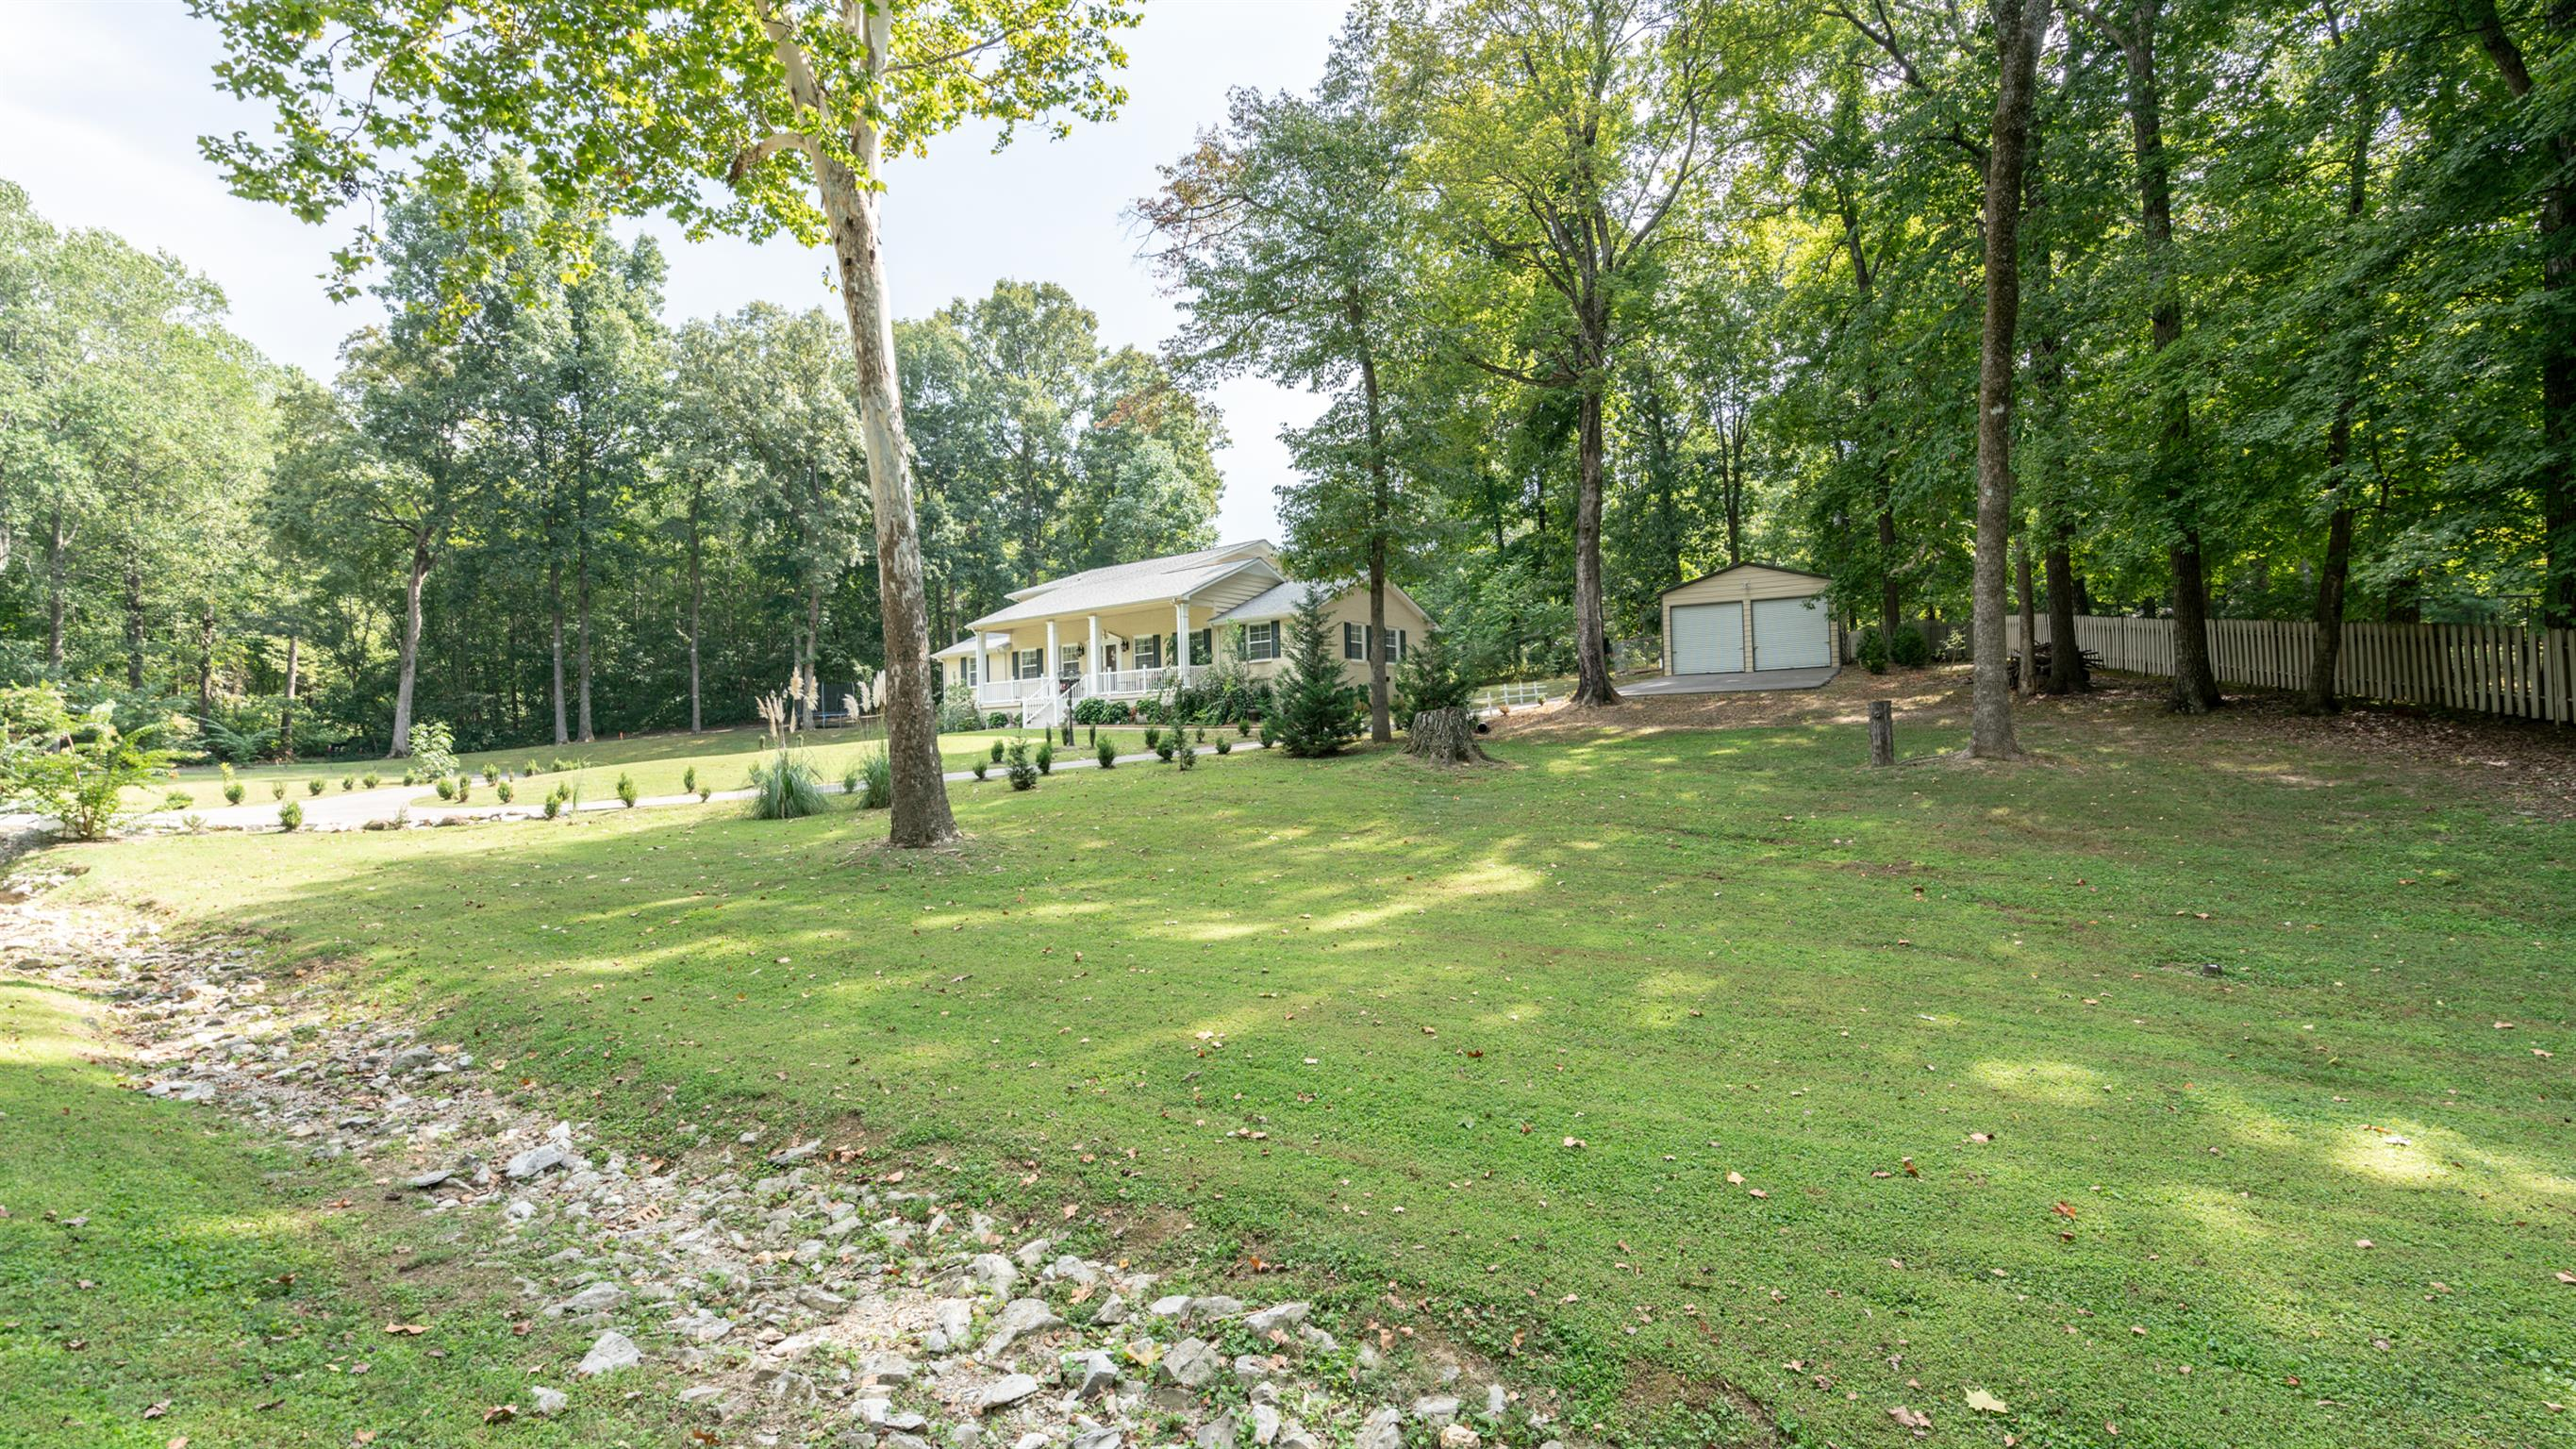 307 Crestview Dr, Dickson, TN 37055 - Dickson, TN real estate listing